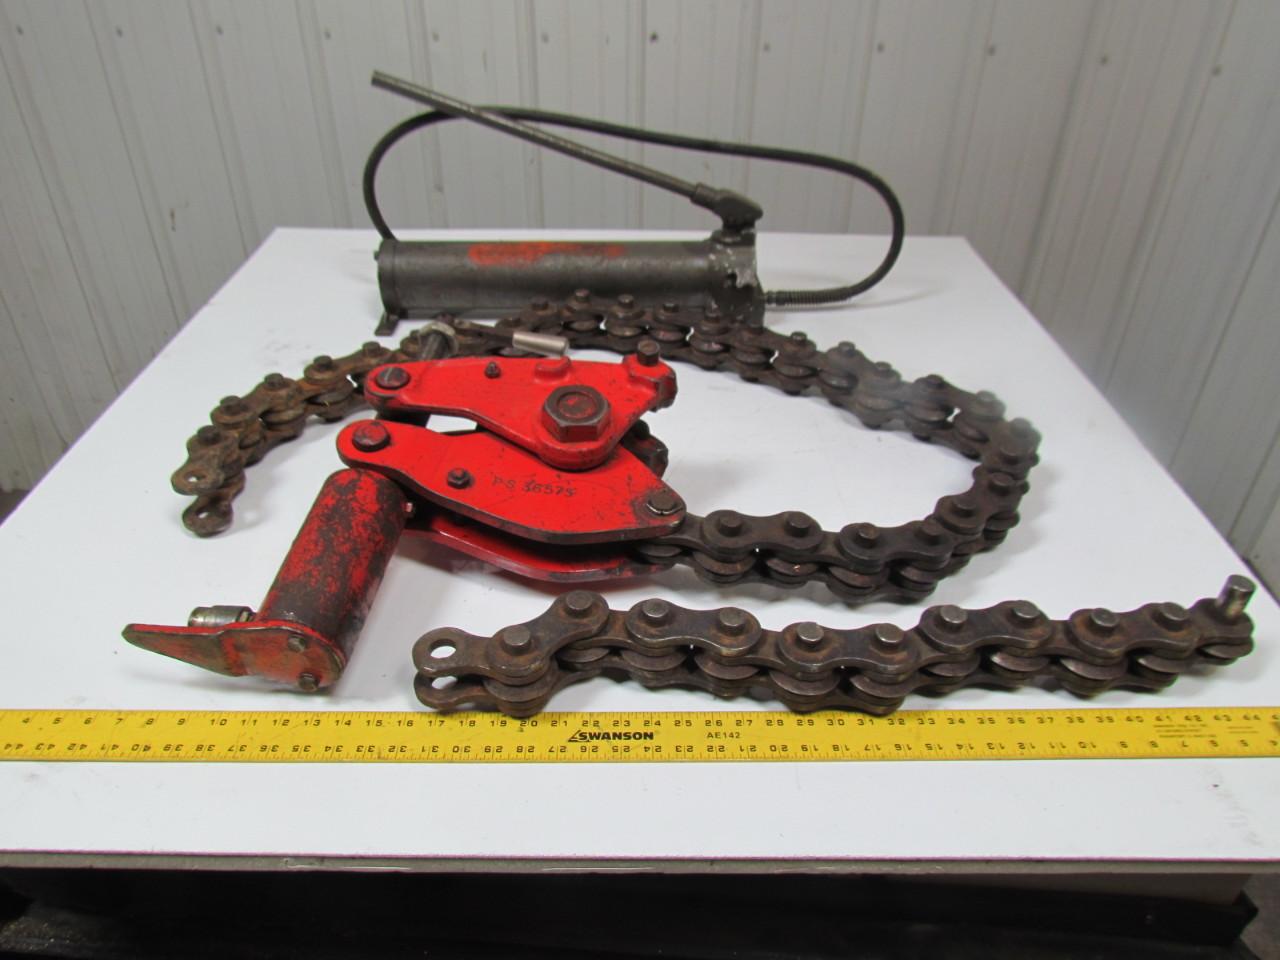 Wheeler rex hydraulic pipe cracker cutter for cast